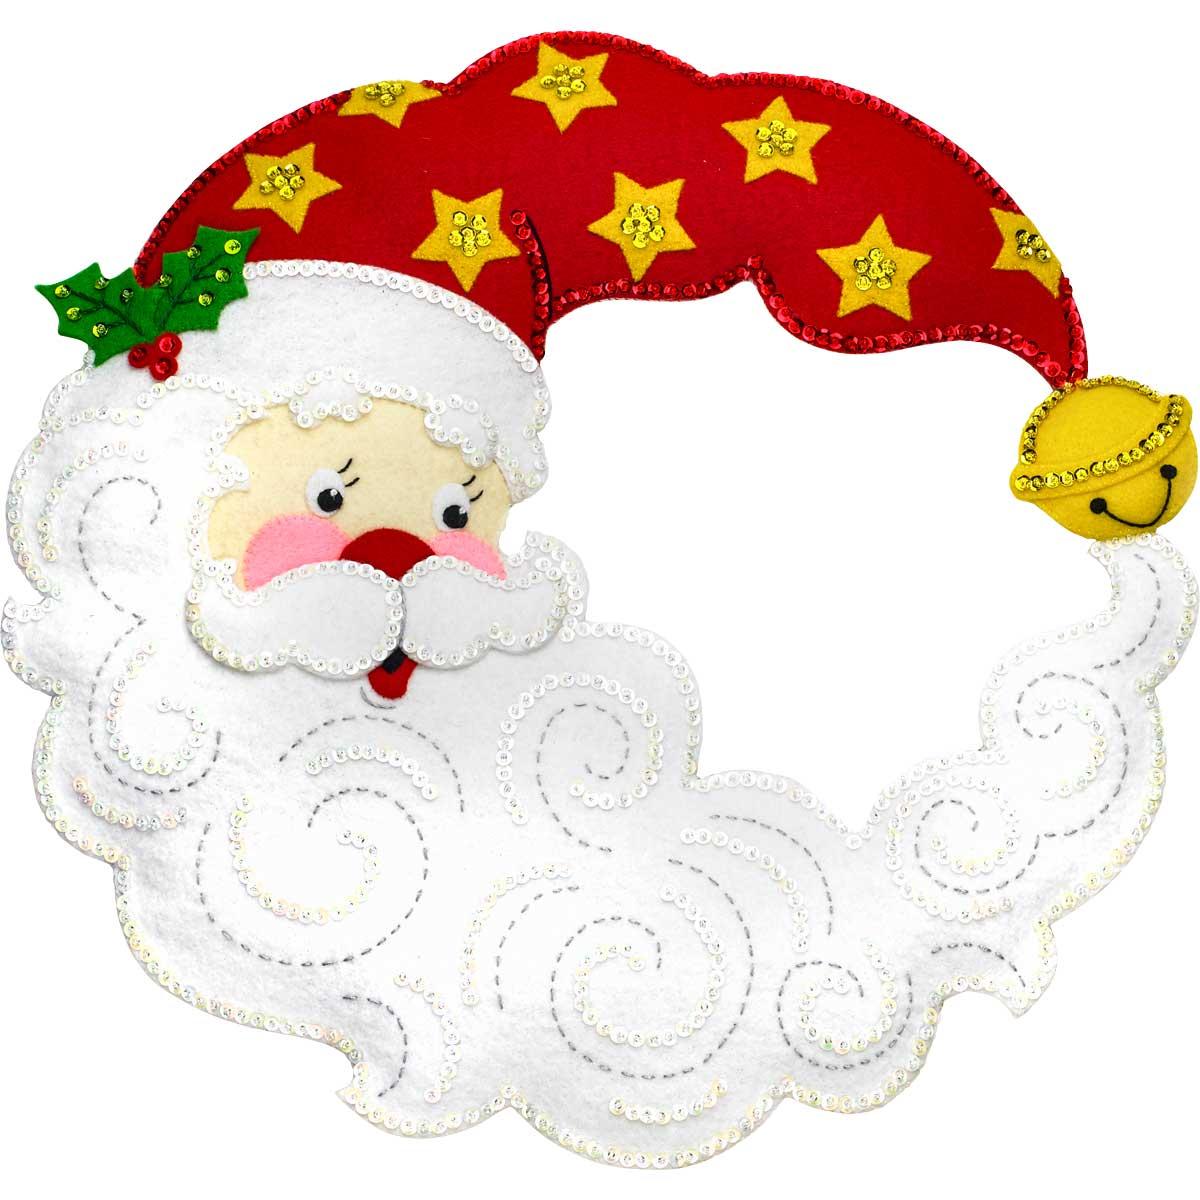 Bucilla ® Seasonal - Felt - Home Decor - Crescent Moon Santa Wreath